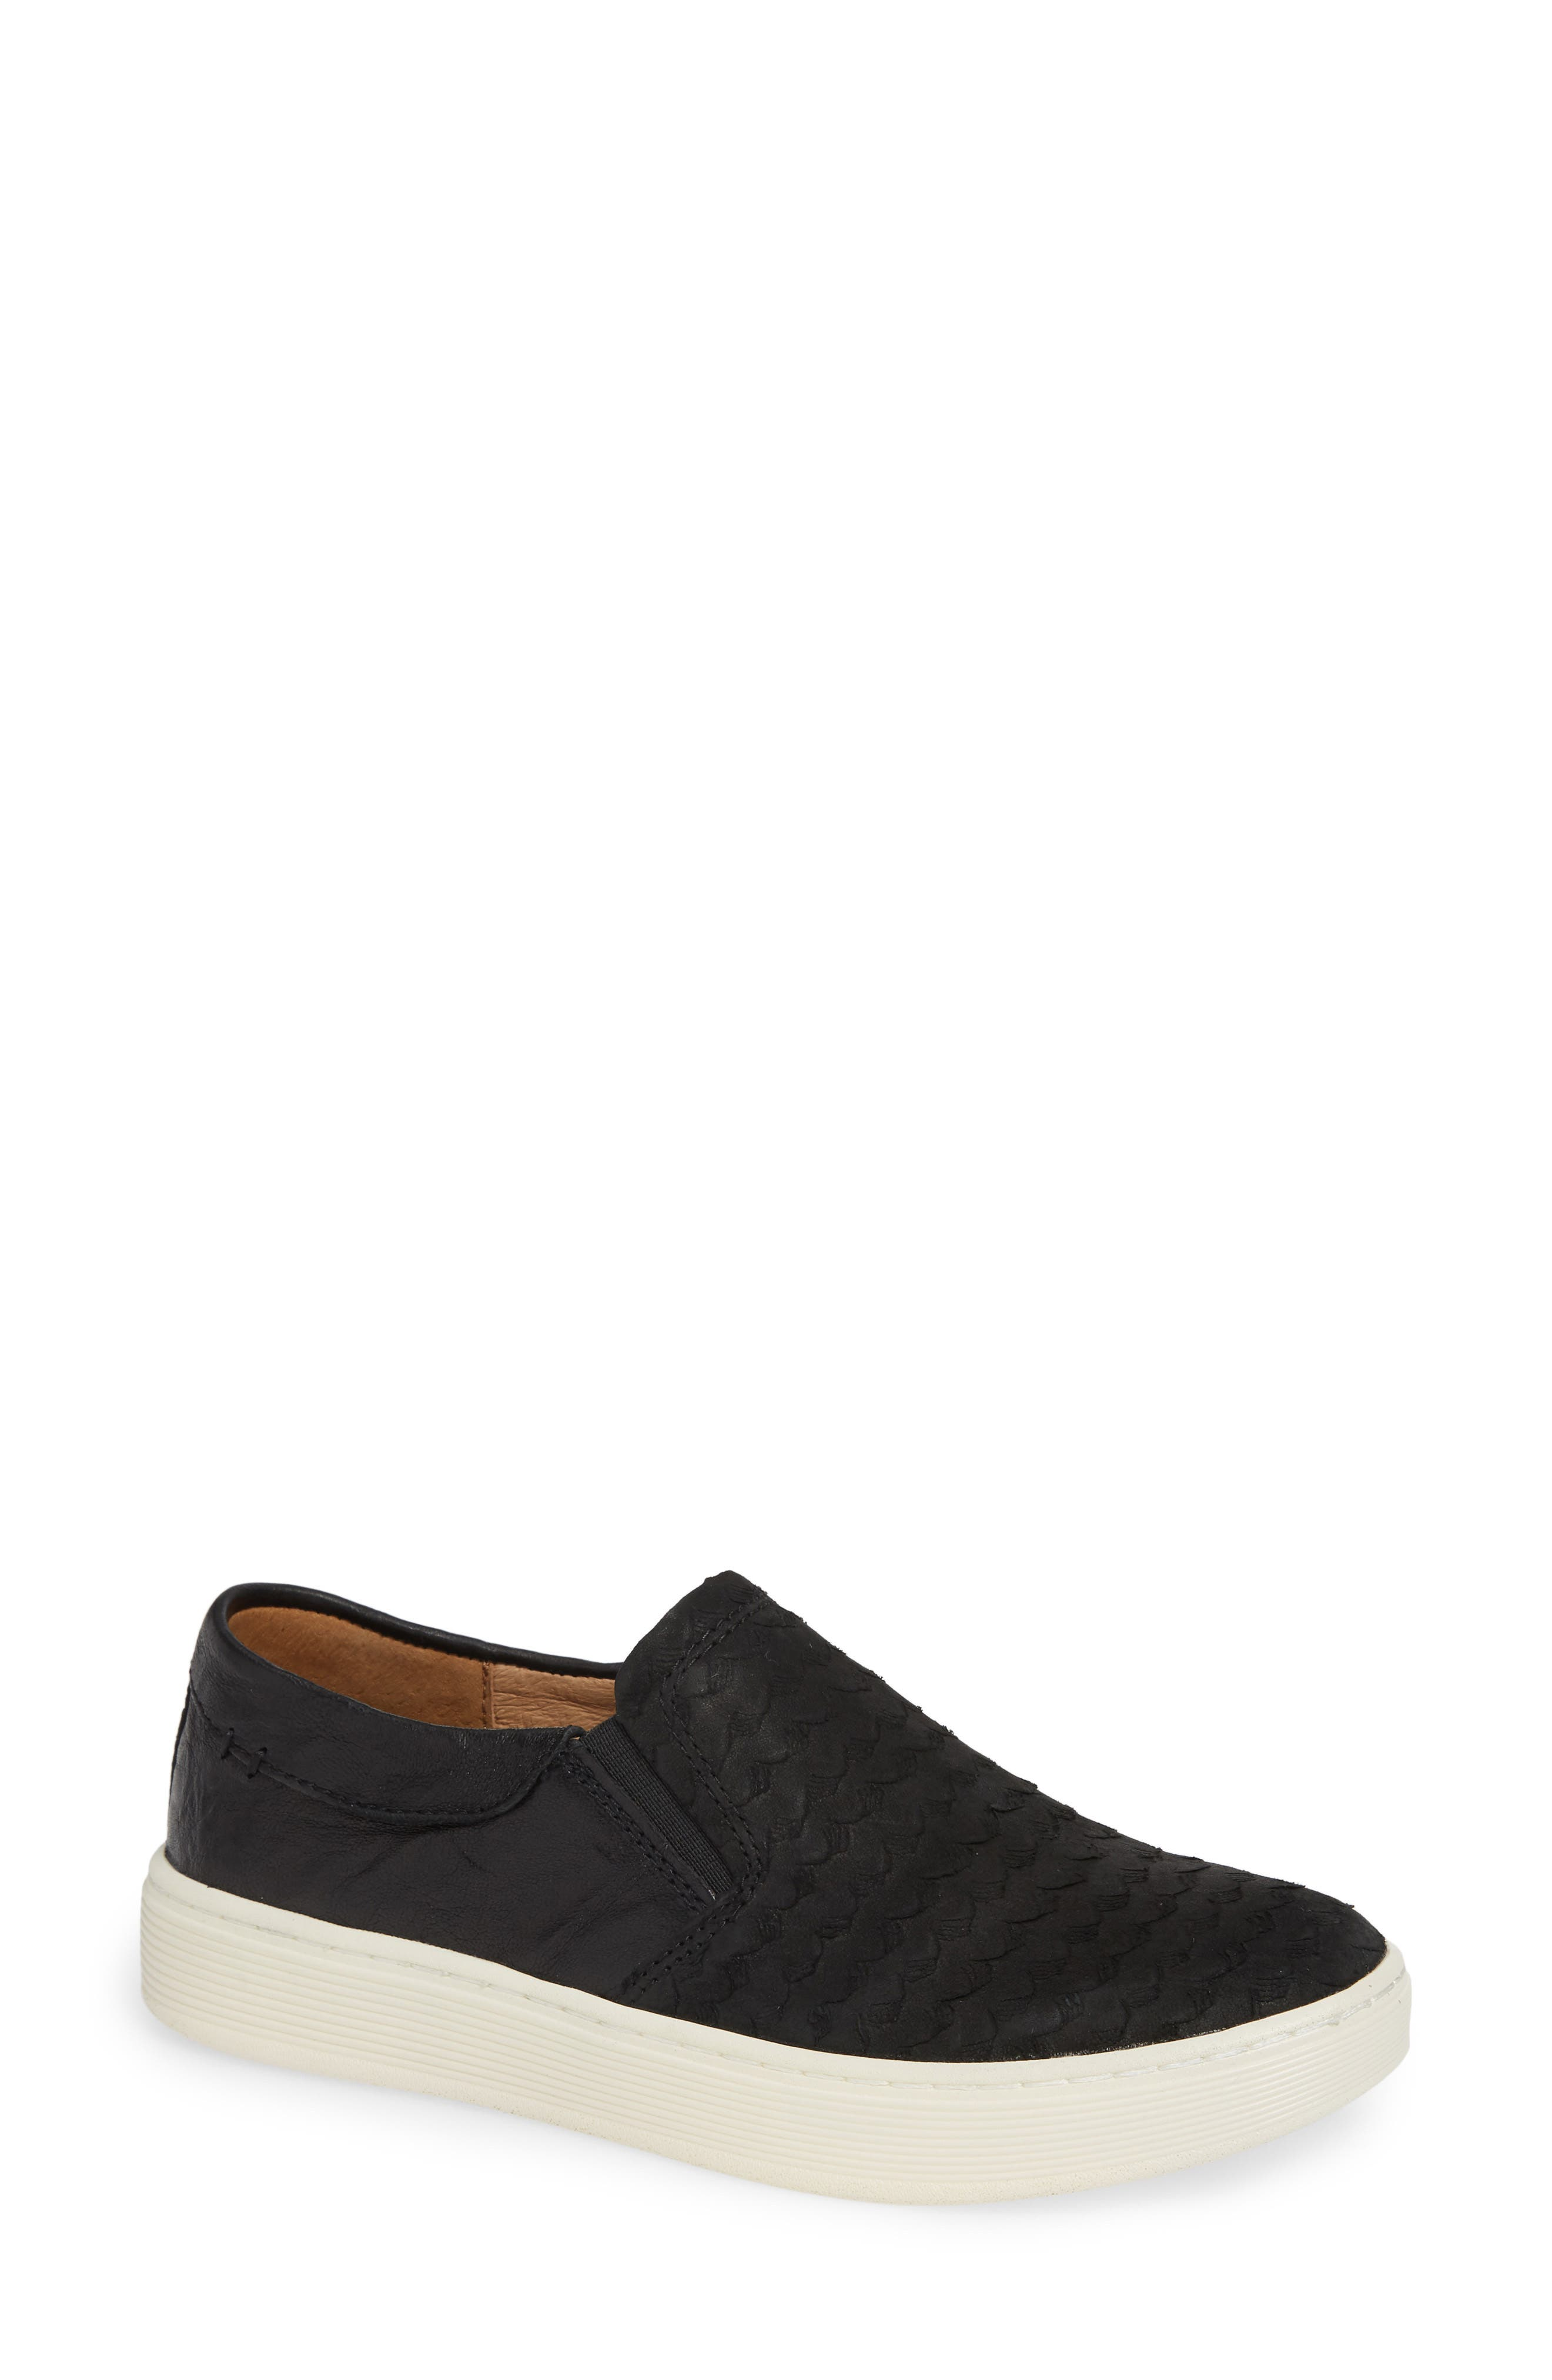 SÖFFT Somers III Slip-On Sneaker, Main, color, 002